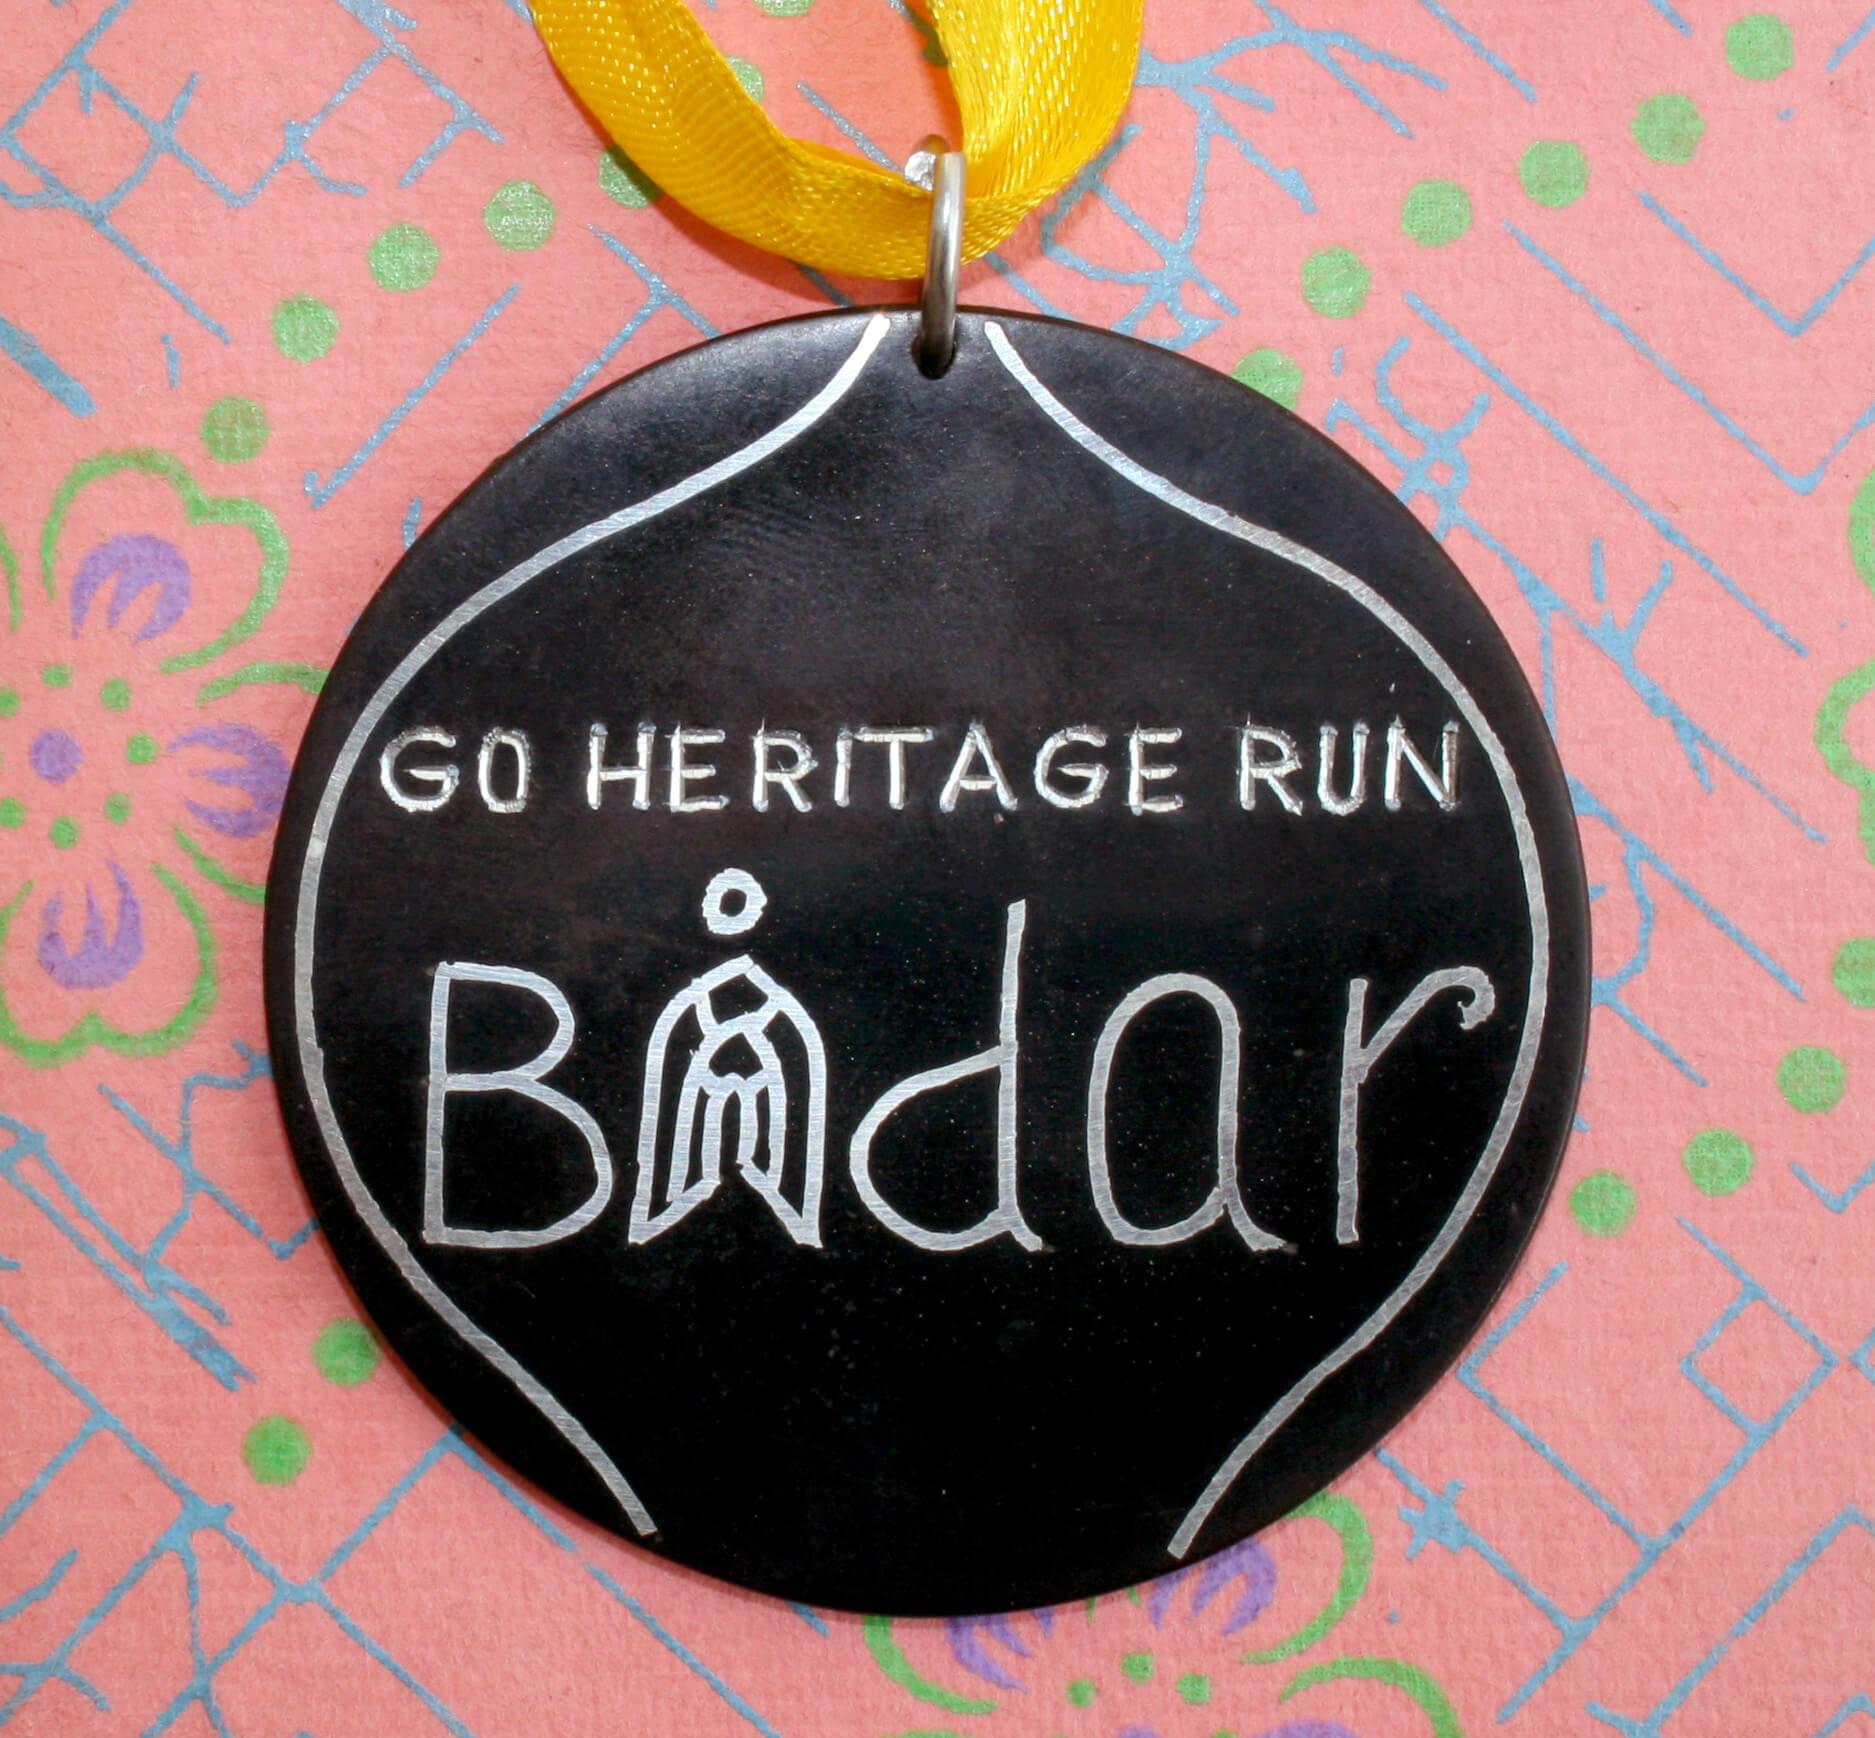 Go-Heritage-Run-Bidar-2017-Medal